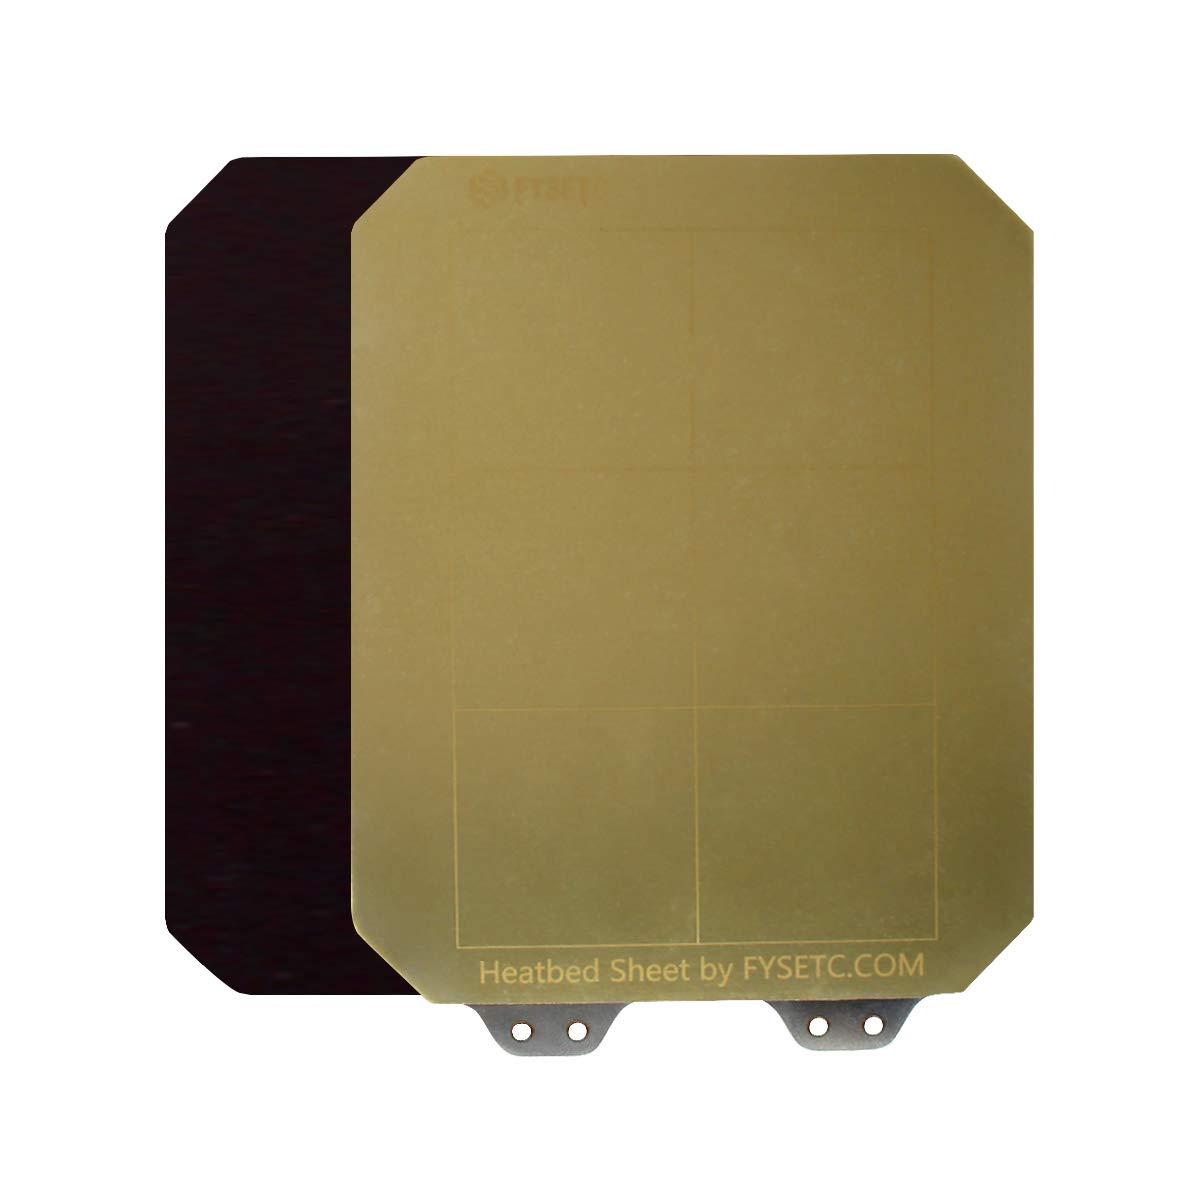 FYSETC3D 인쇄 BUILDPLATE 강철 스프링 시트 침대 W   코너 절단 160X130MM   6.3X5.1INCH PEI+B 자기 설치에 대한 기본 MONOPRICE 선택 미니 V2   V1   PRO   V3   MALYAN M200